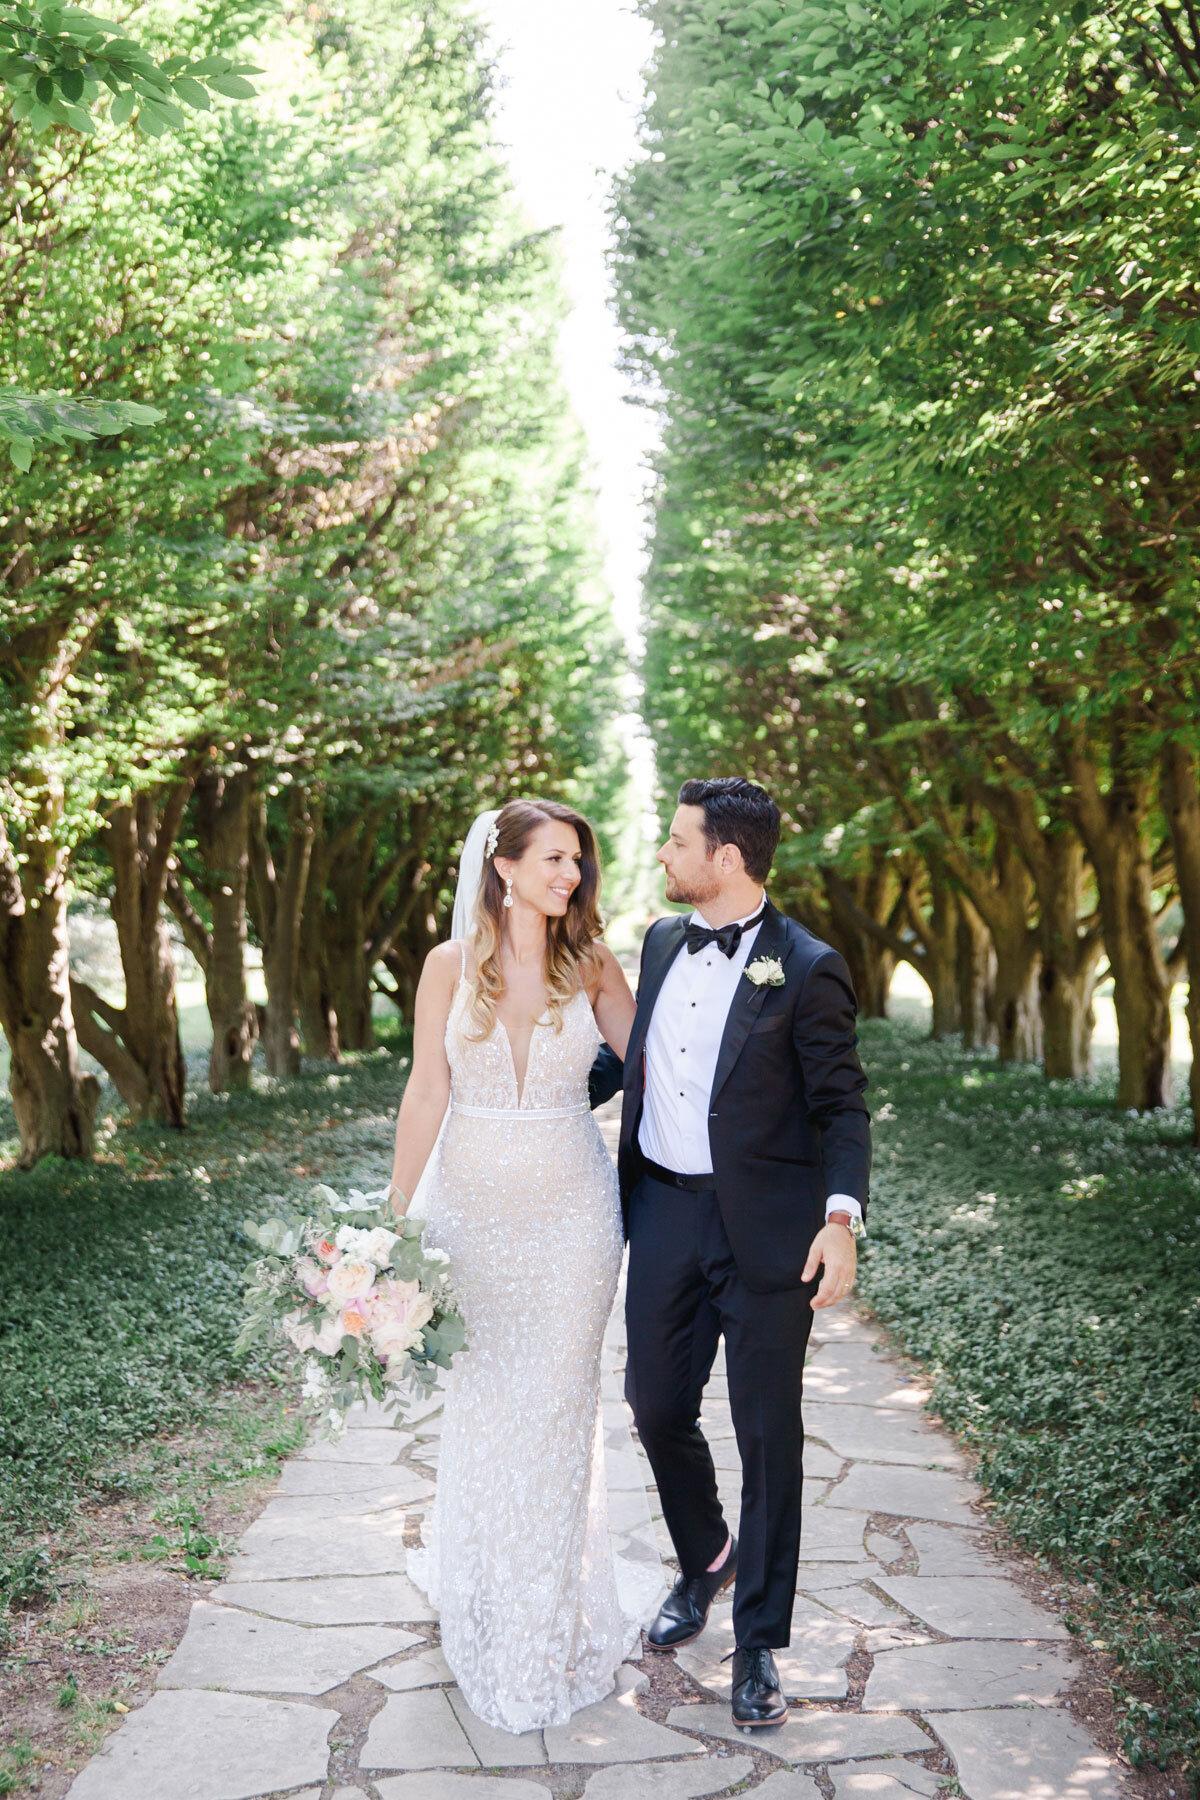 Chateau-des-Charmes-Wedding-Summer-Vineyard-Bride-Niagara-on-the-Lake-photos-by-Gemini-Photography-Ontario-0023.jpg